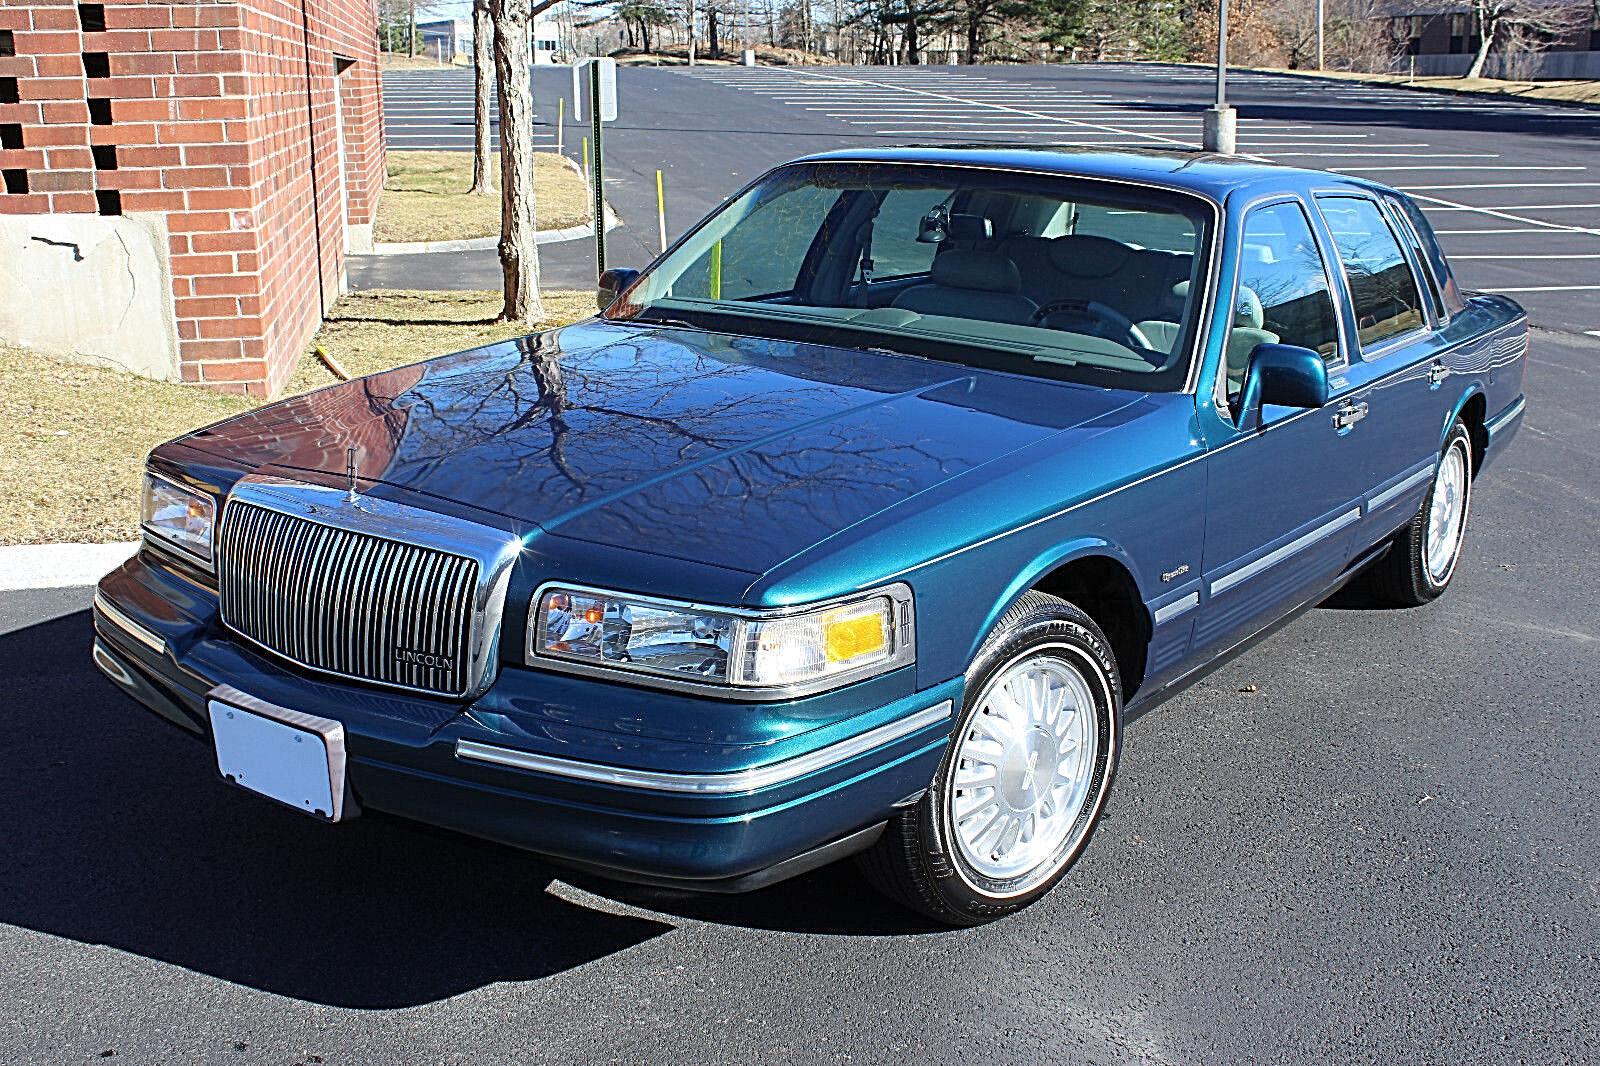 1997 Lincoln Town Car Signature Series 51k Miles Texas Car Rust Free